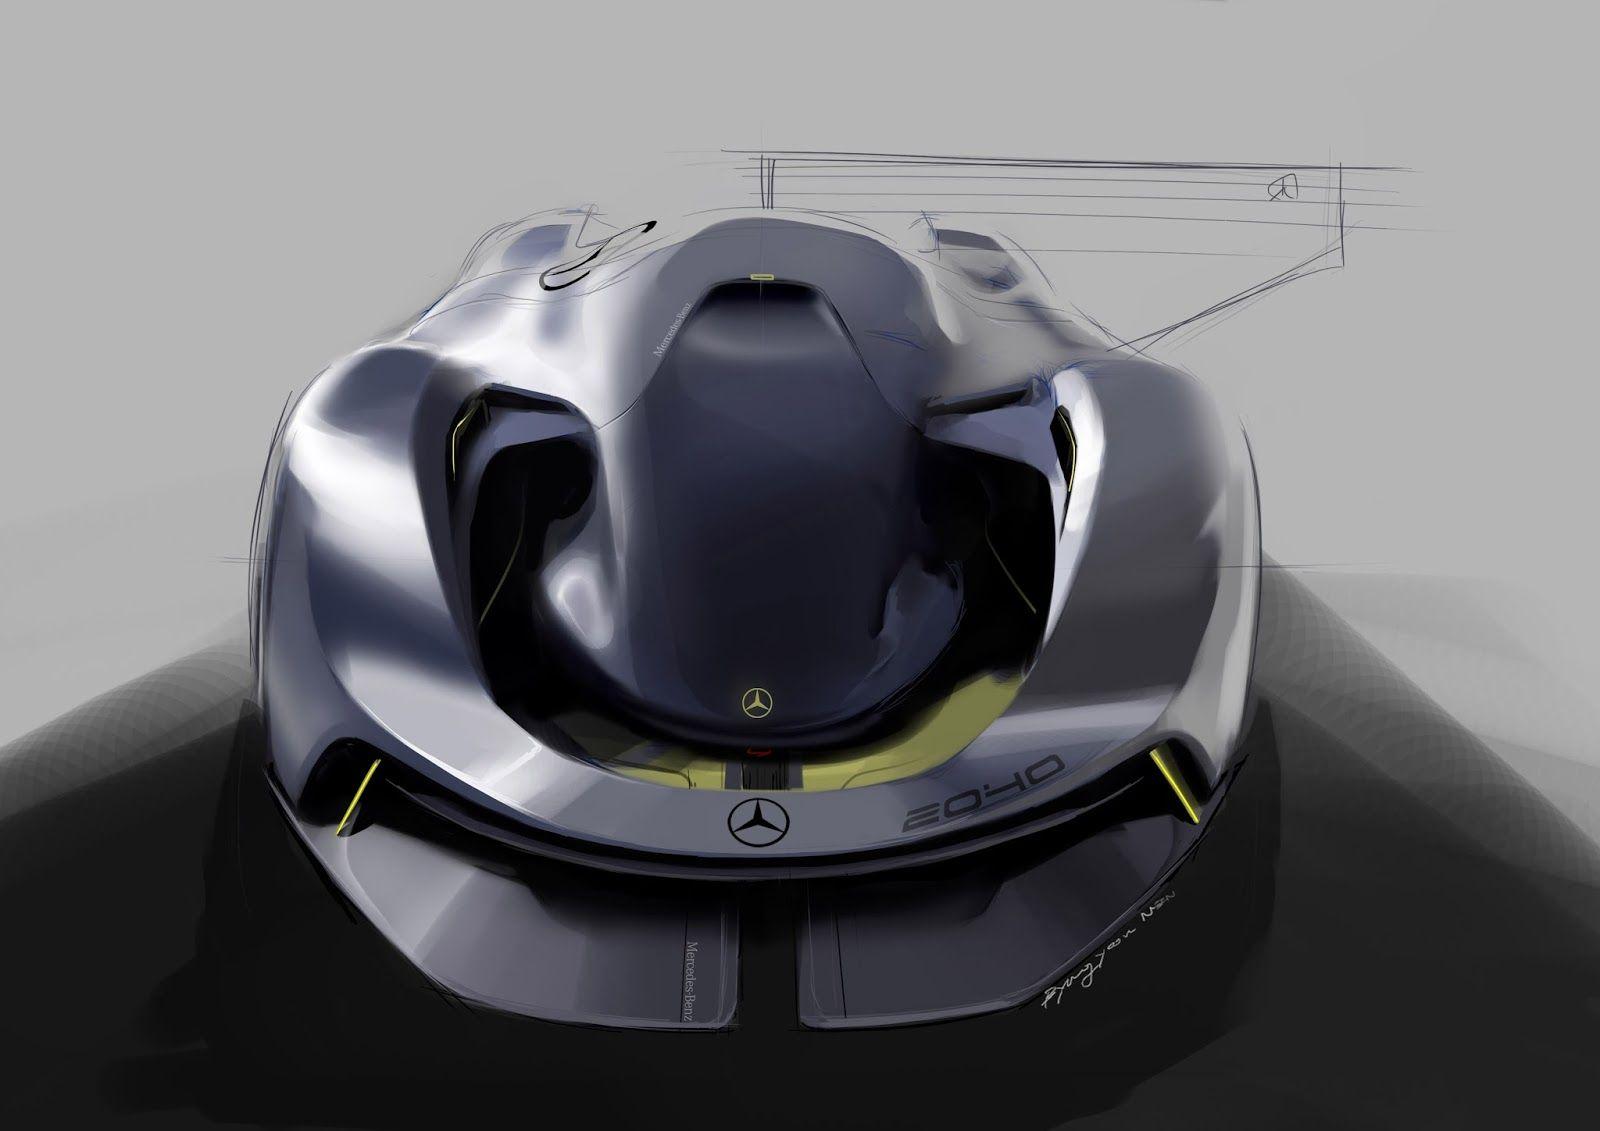 minbyungyoon future racecars pinterest. Black Bedroom Furniture Sets. Home Design Ideas